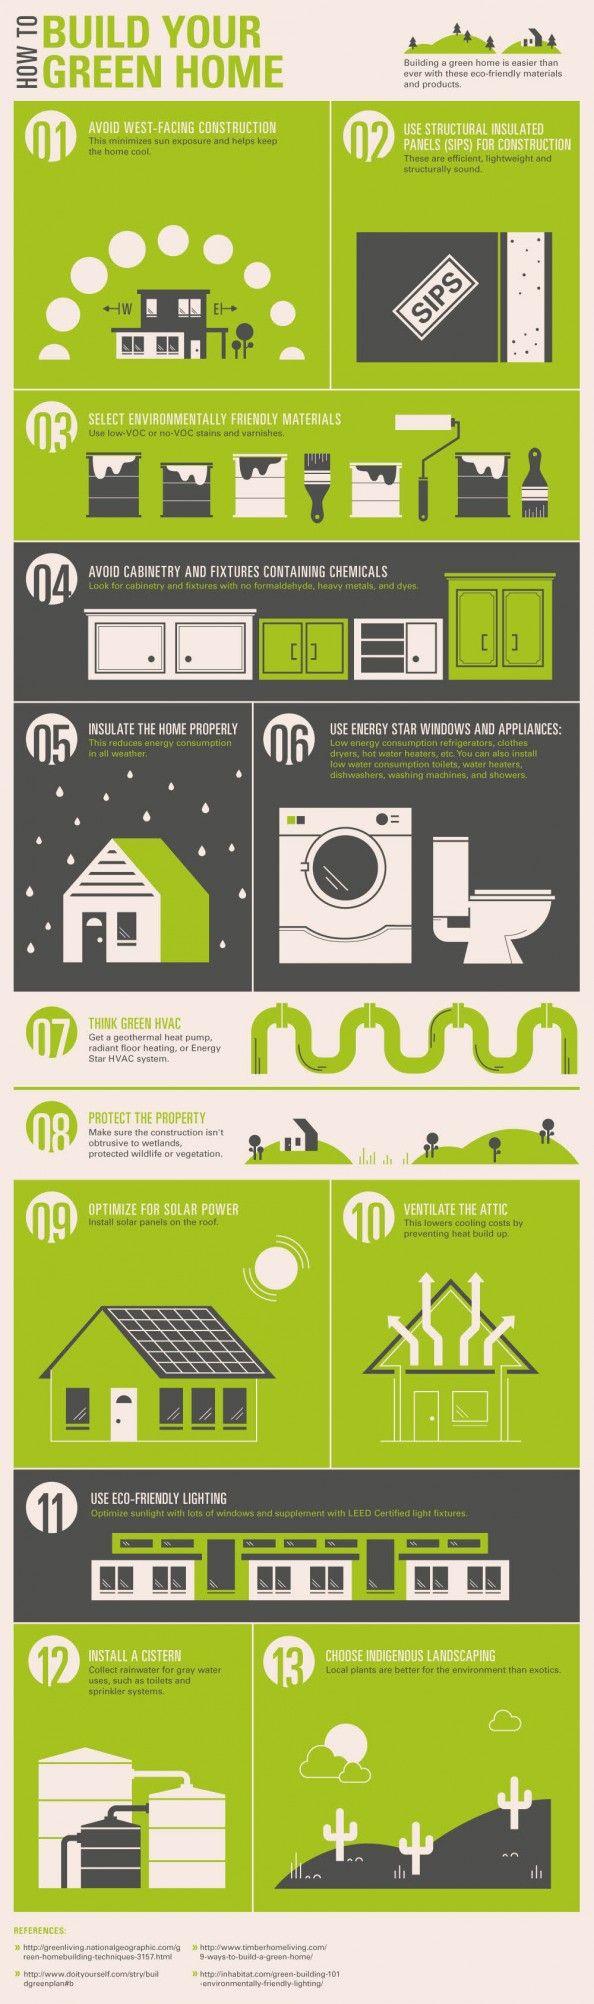 [Thirteen Elements Of A Dream Green Home*] Http://visual.